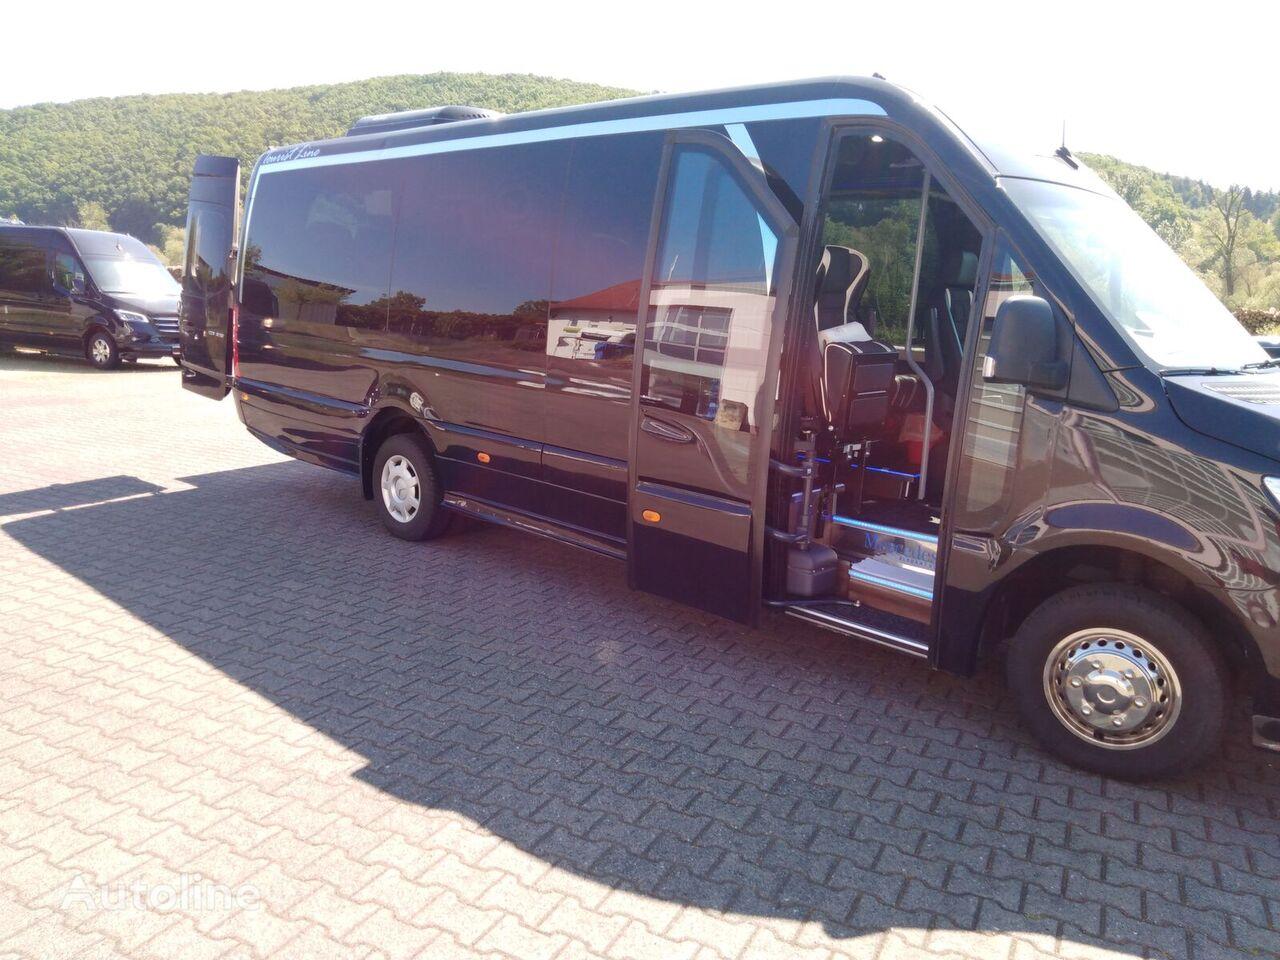 MERCEDES-BENZ 516CDI05 Sprinter 907 XXL Panor-Komfort Automatik 24 Pl XXL Reisebus